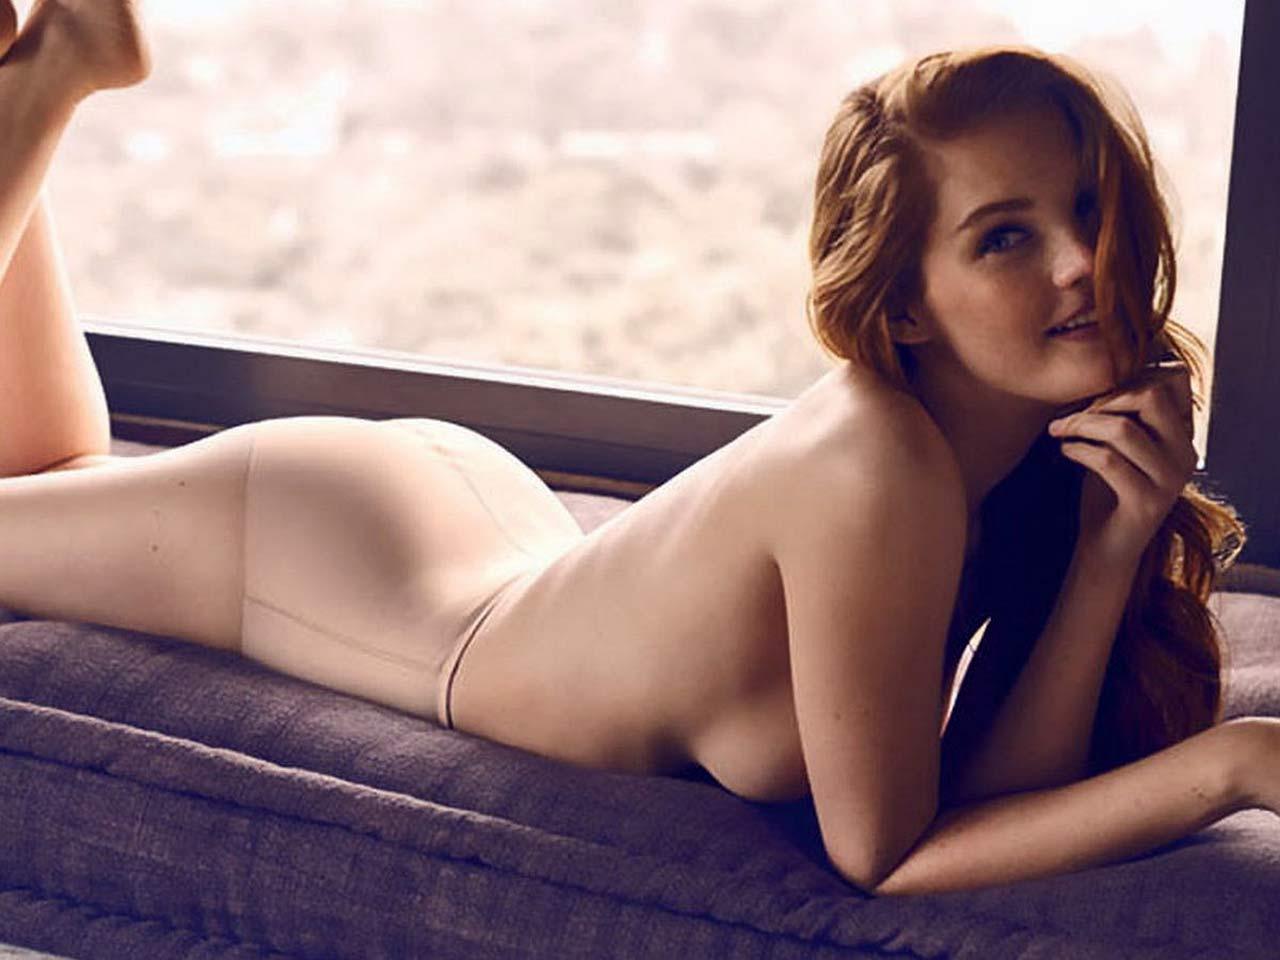 XXX Alexina Graham naked (91 photo), Pussy, Hot, Boobs, butt 2019